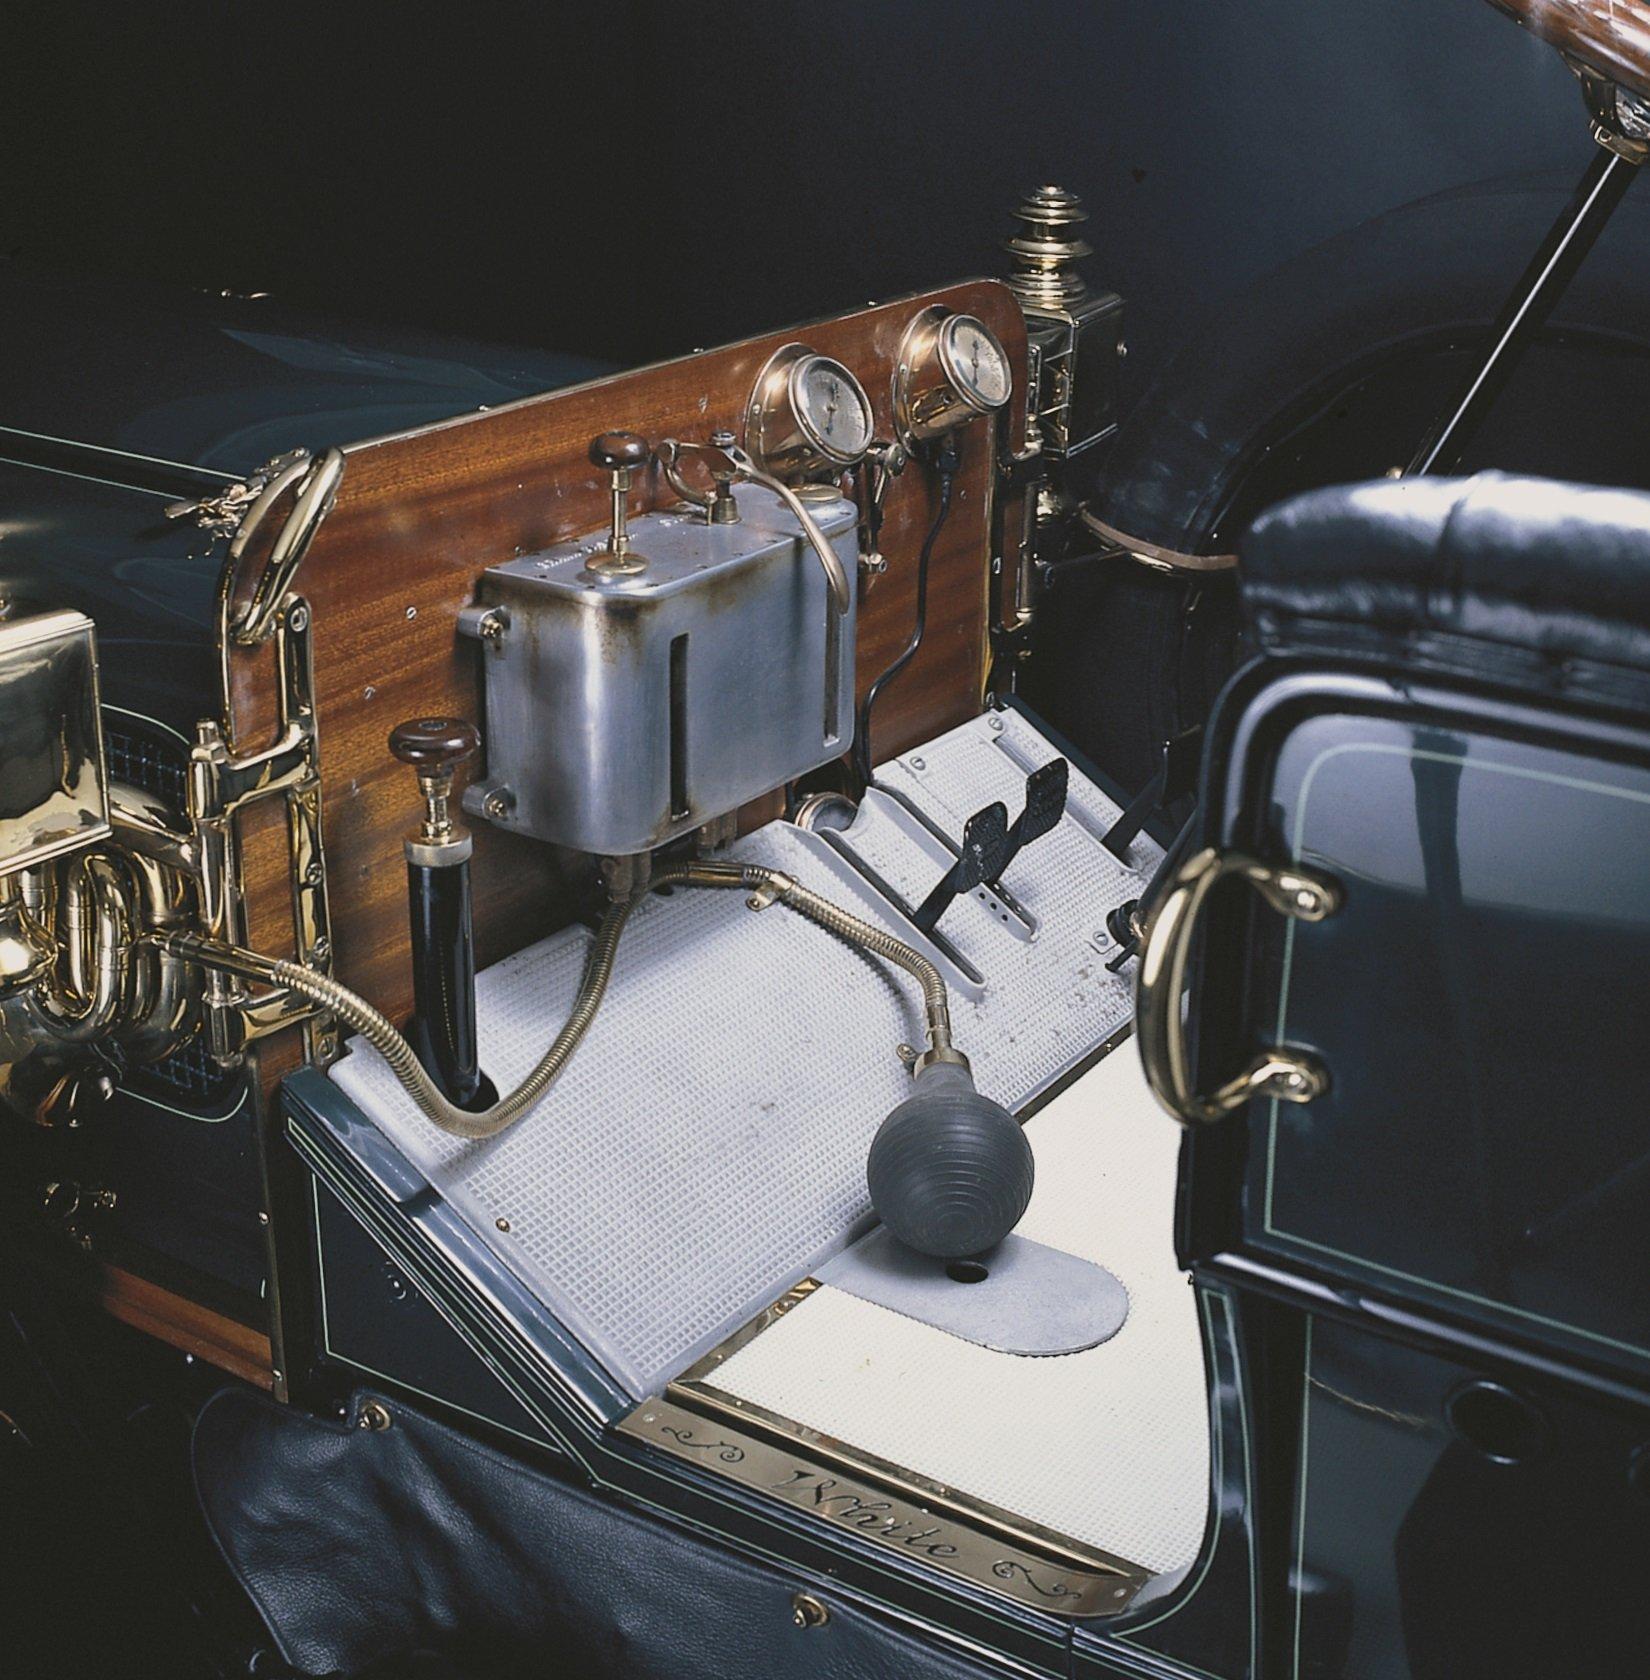 Taft's 1909 White Steam Car